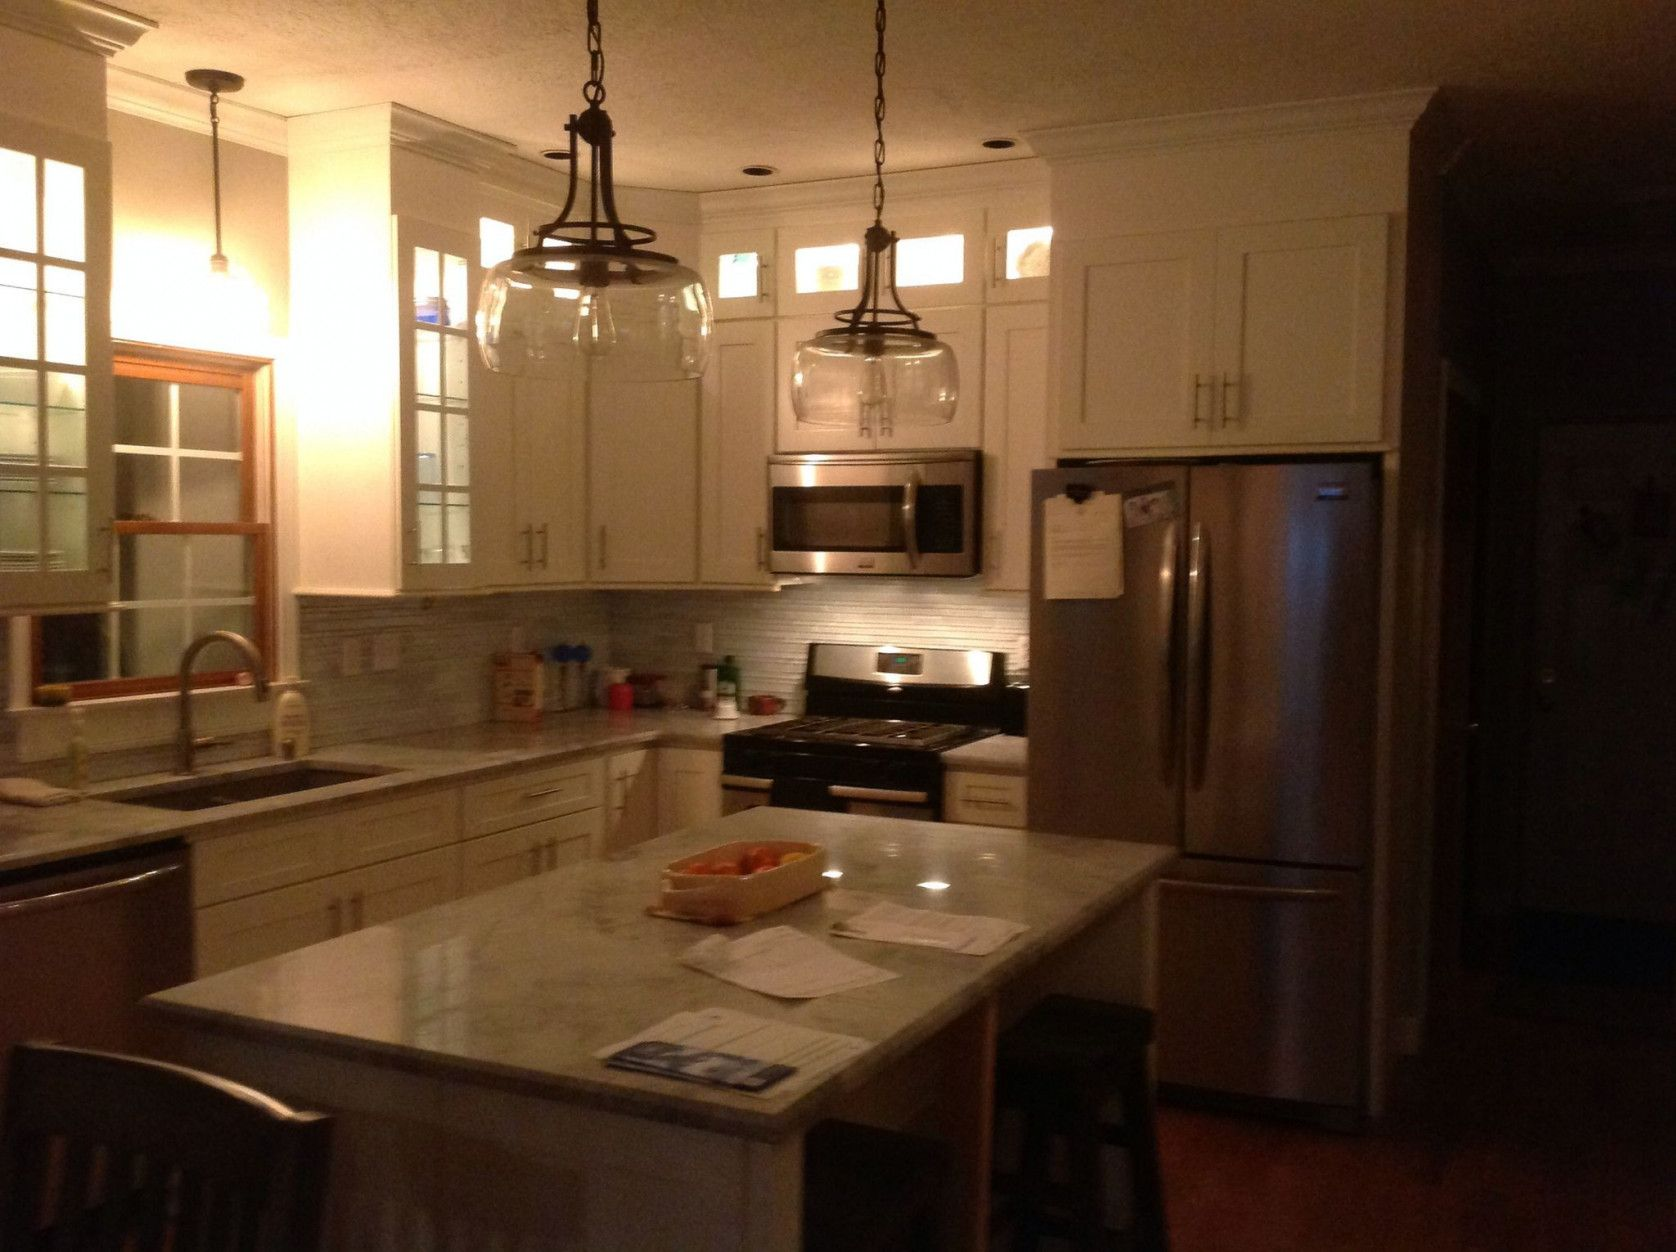 99+ Kitchen Cabinets Akron Ohio - Chalkboard Ideas for Kitchen Check ...